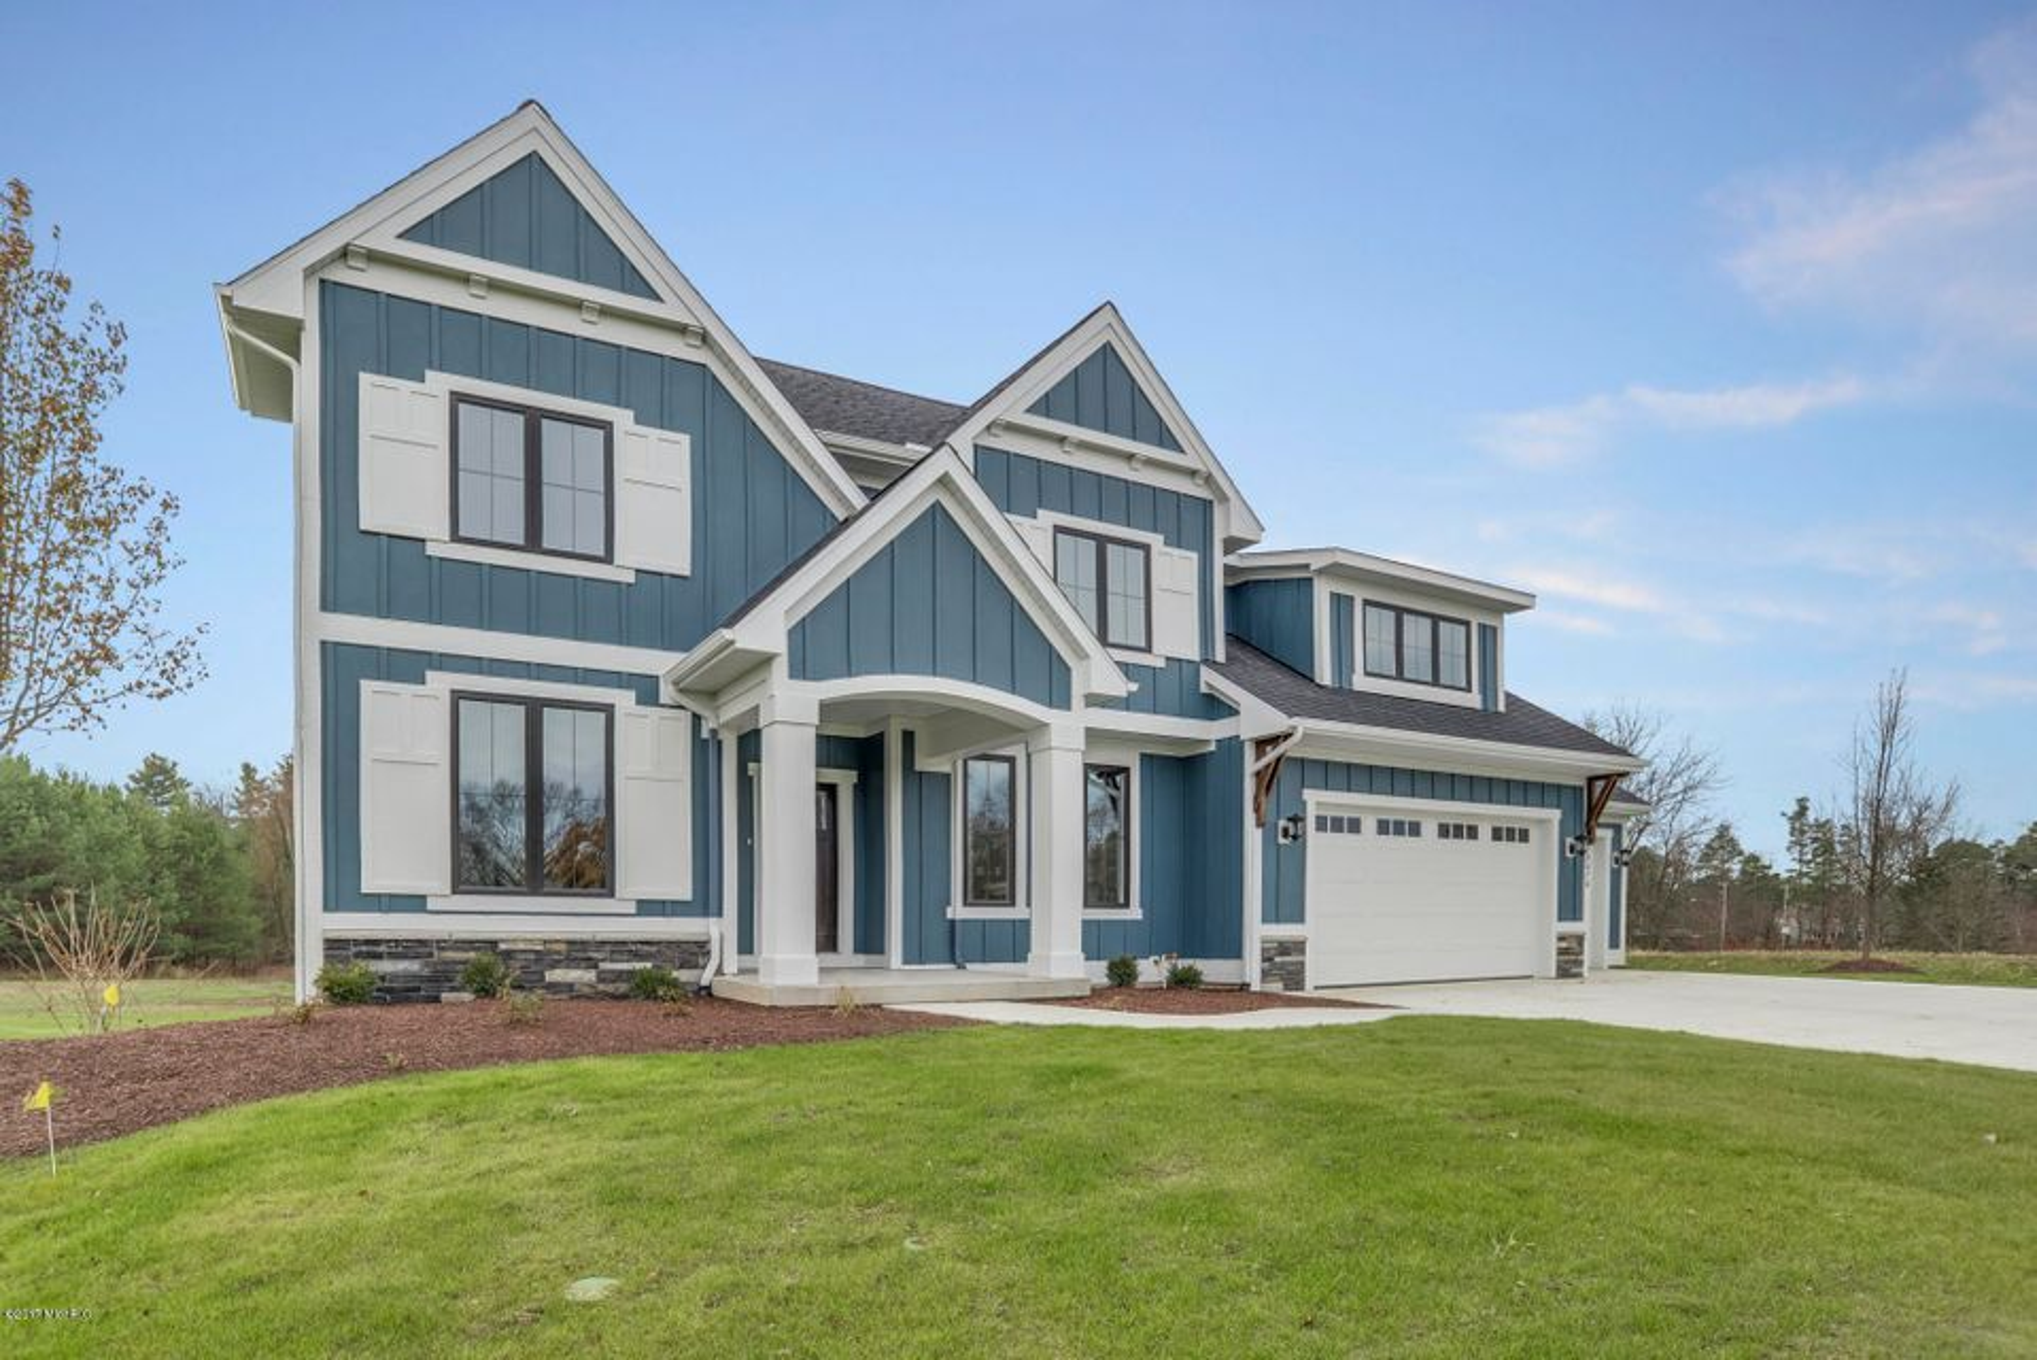 Single Family Home for Sale at 7080 Ashwood 7080 Ashwood Ada, Michigan 49301 United States